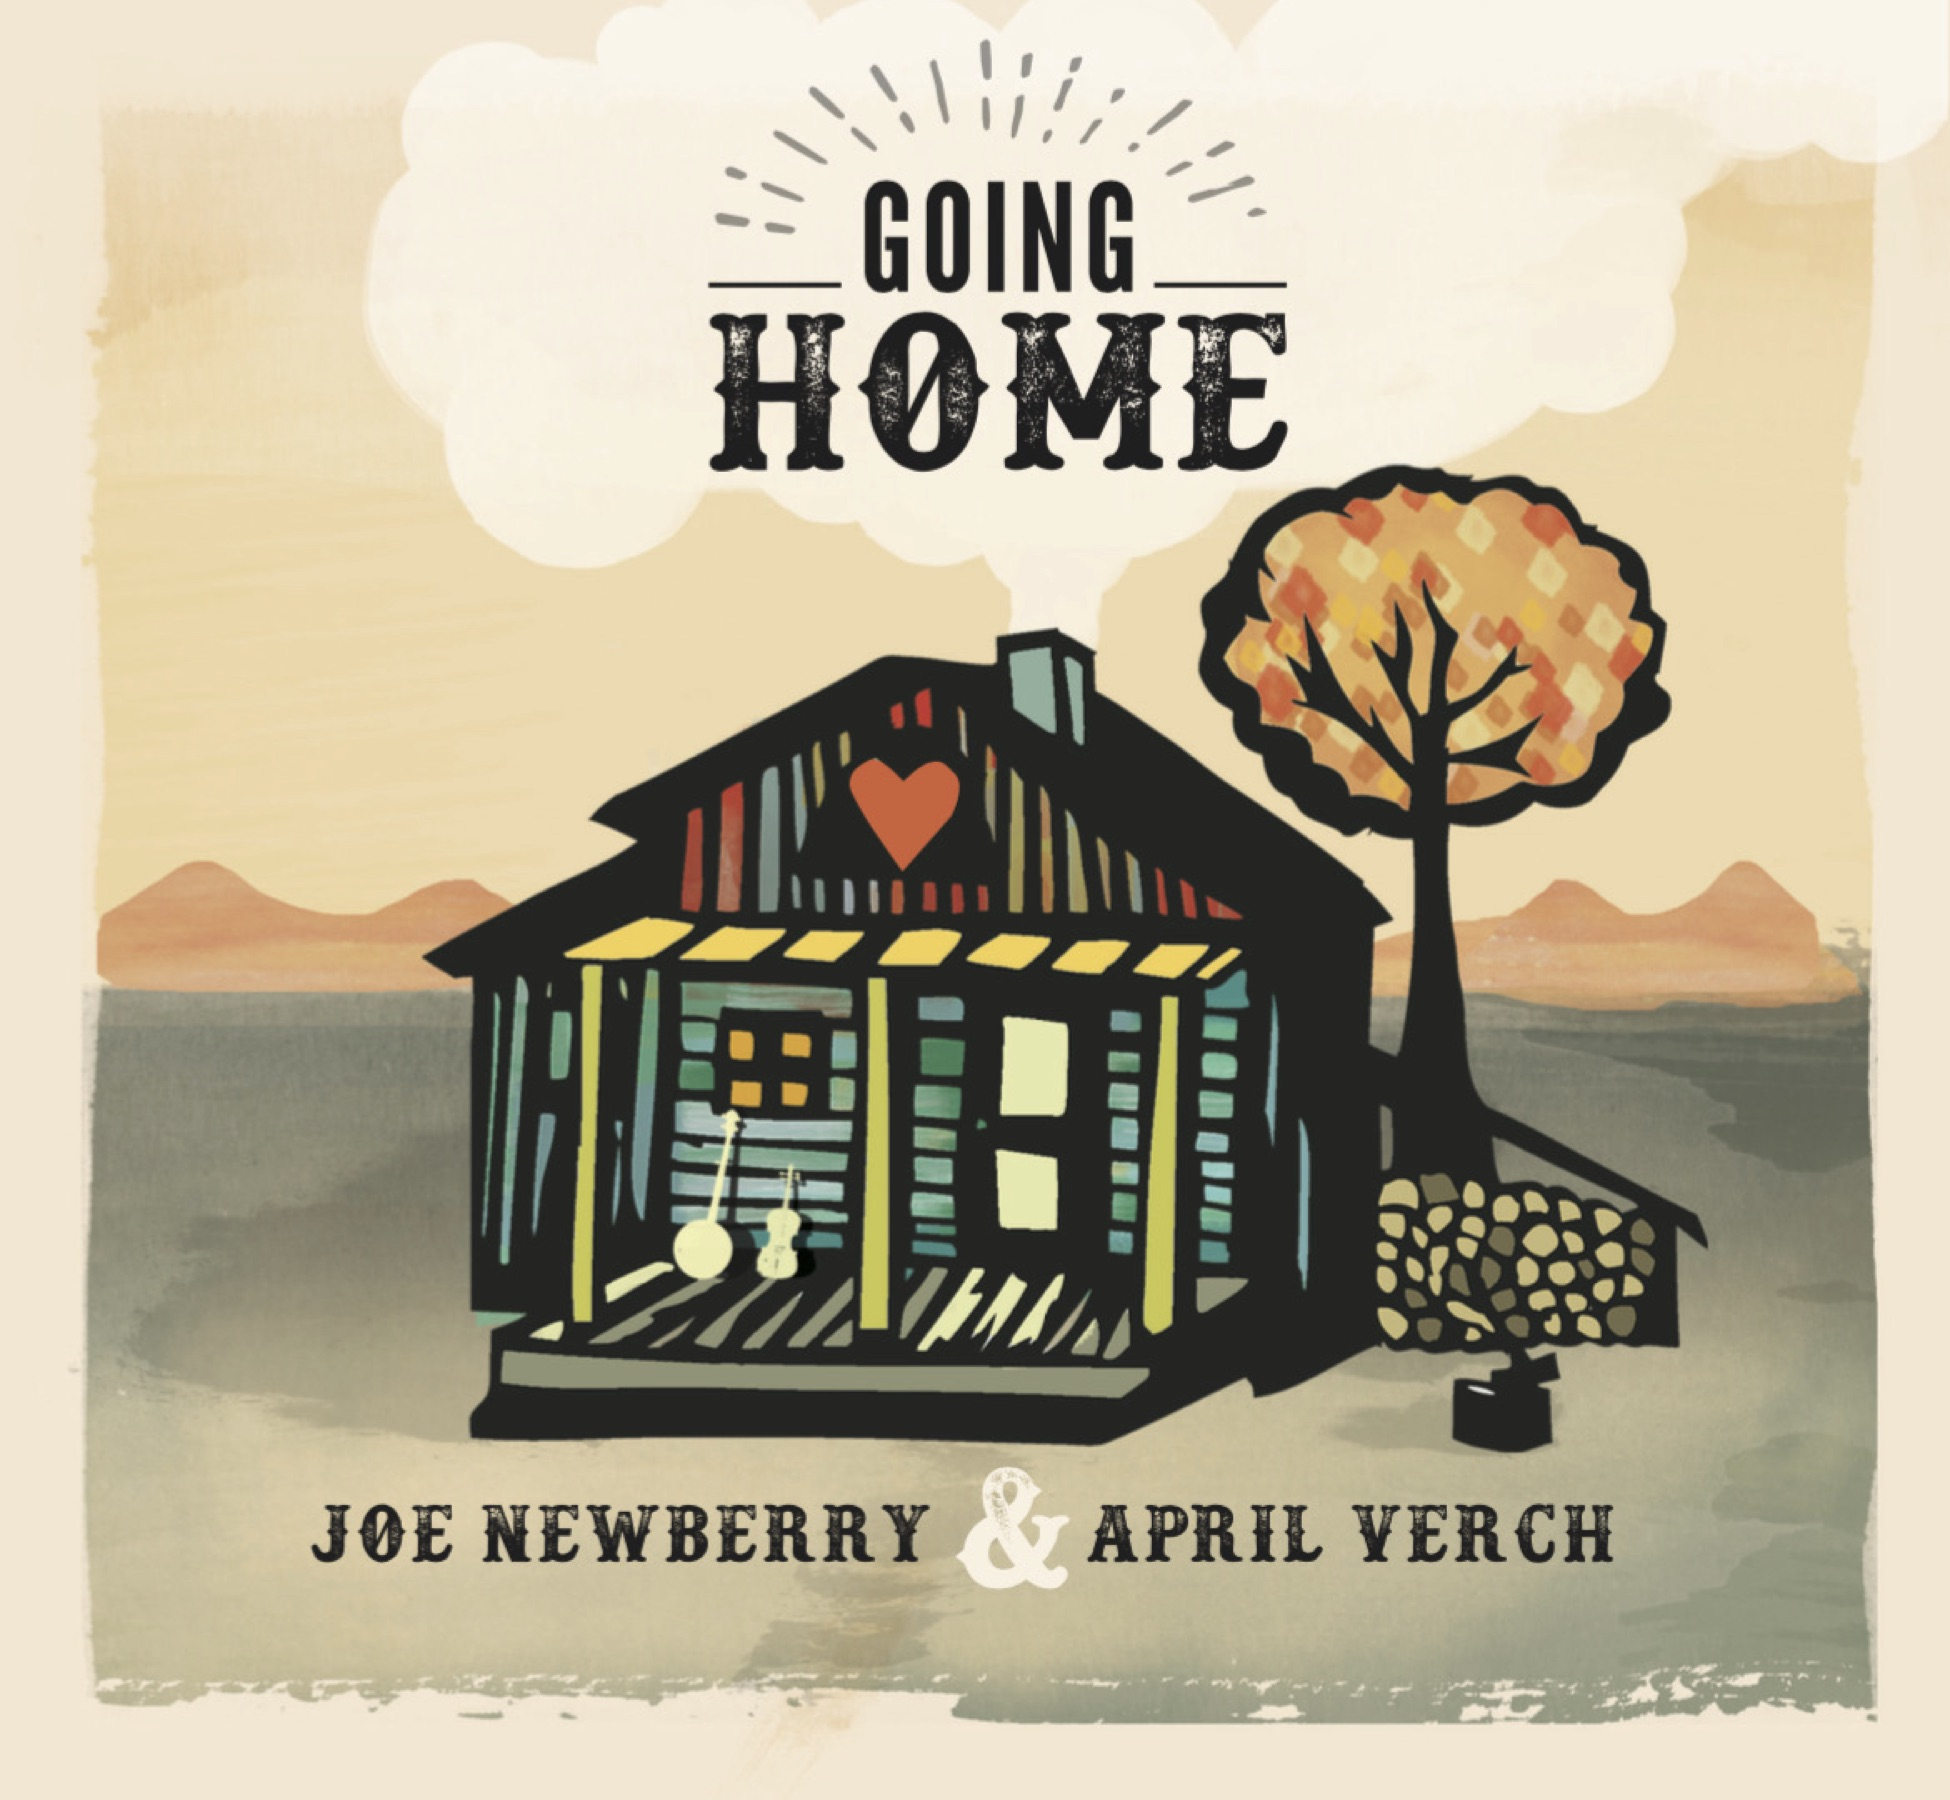 Joe Newberry & April Verch- Going Home Cover.jpg